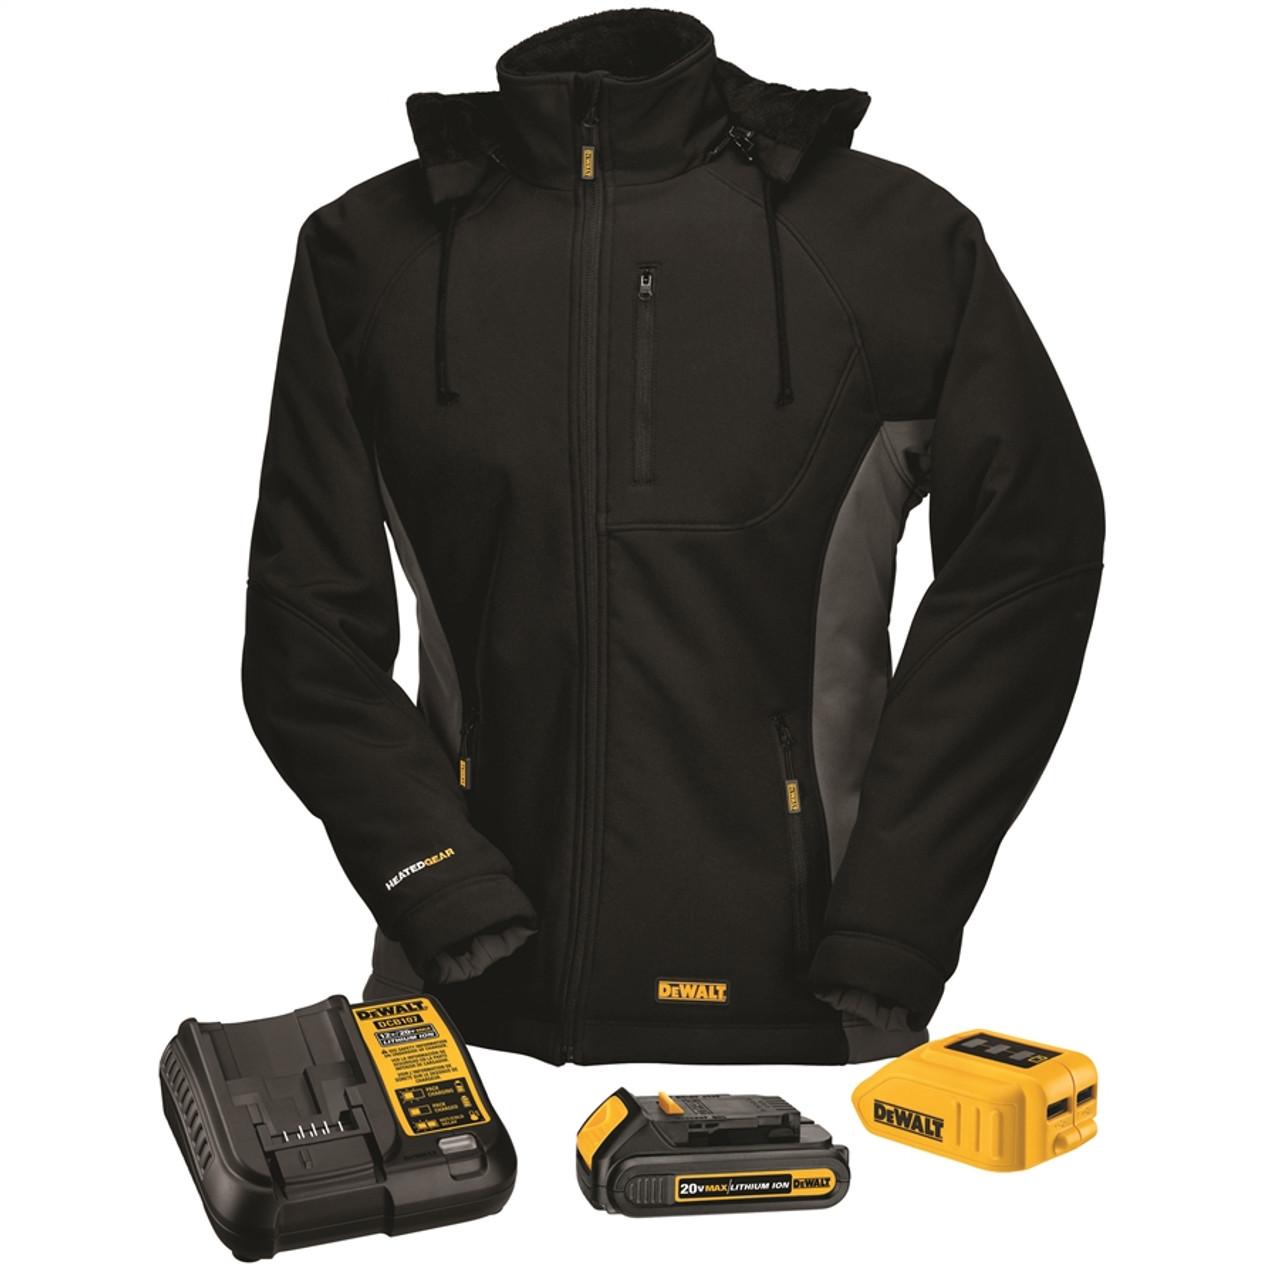 Dewalt 20v 12v Max Womens Heated Jacket Kit Dchj066c1